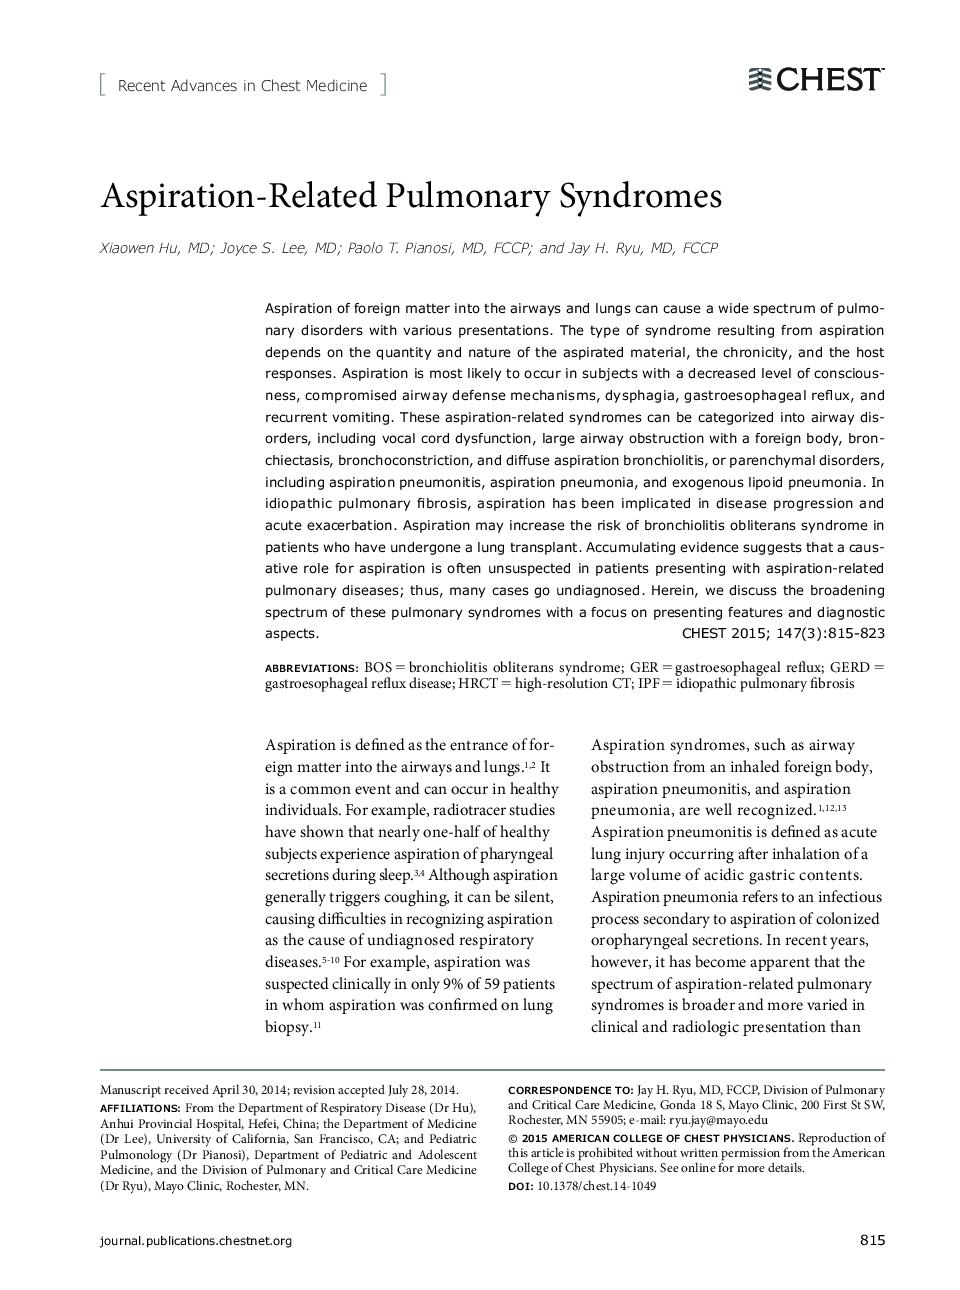 Aspiration-Related Pulmonary Syndromes